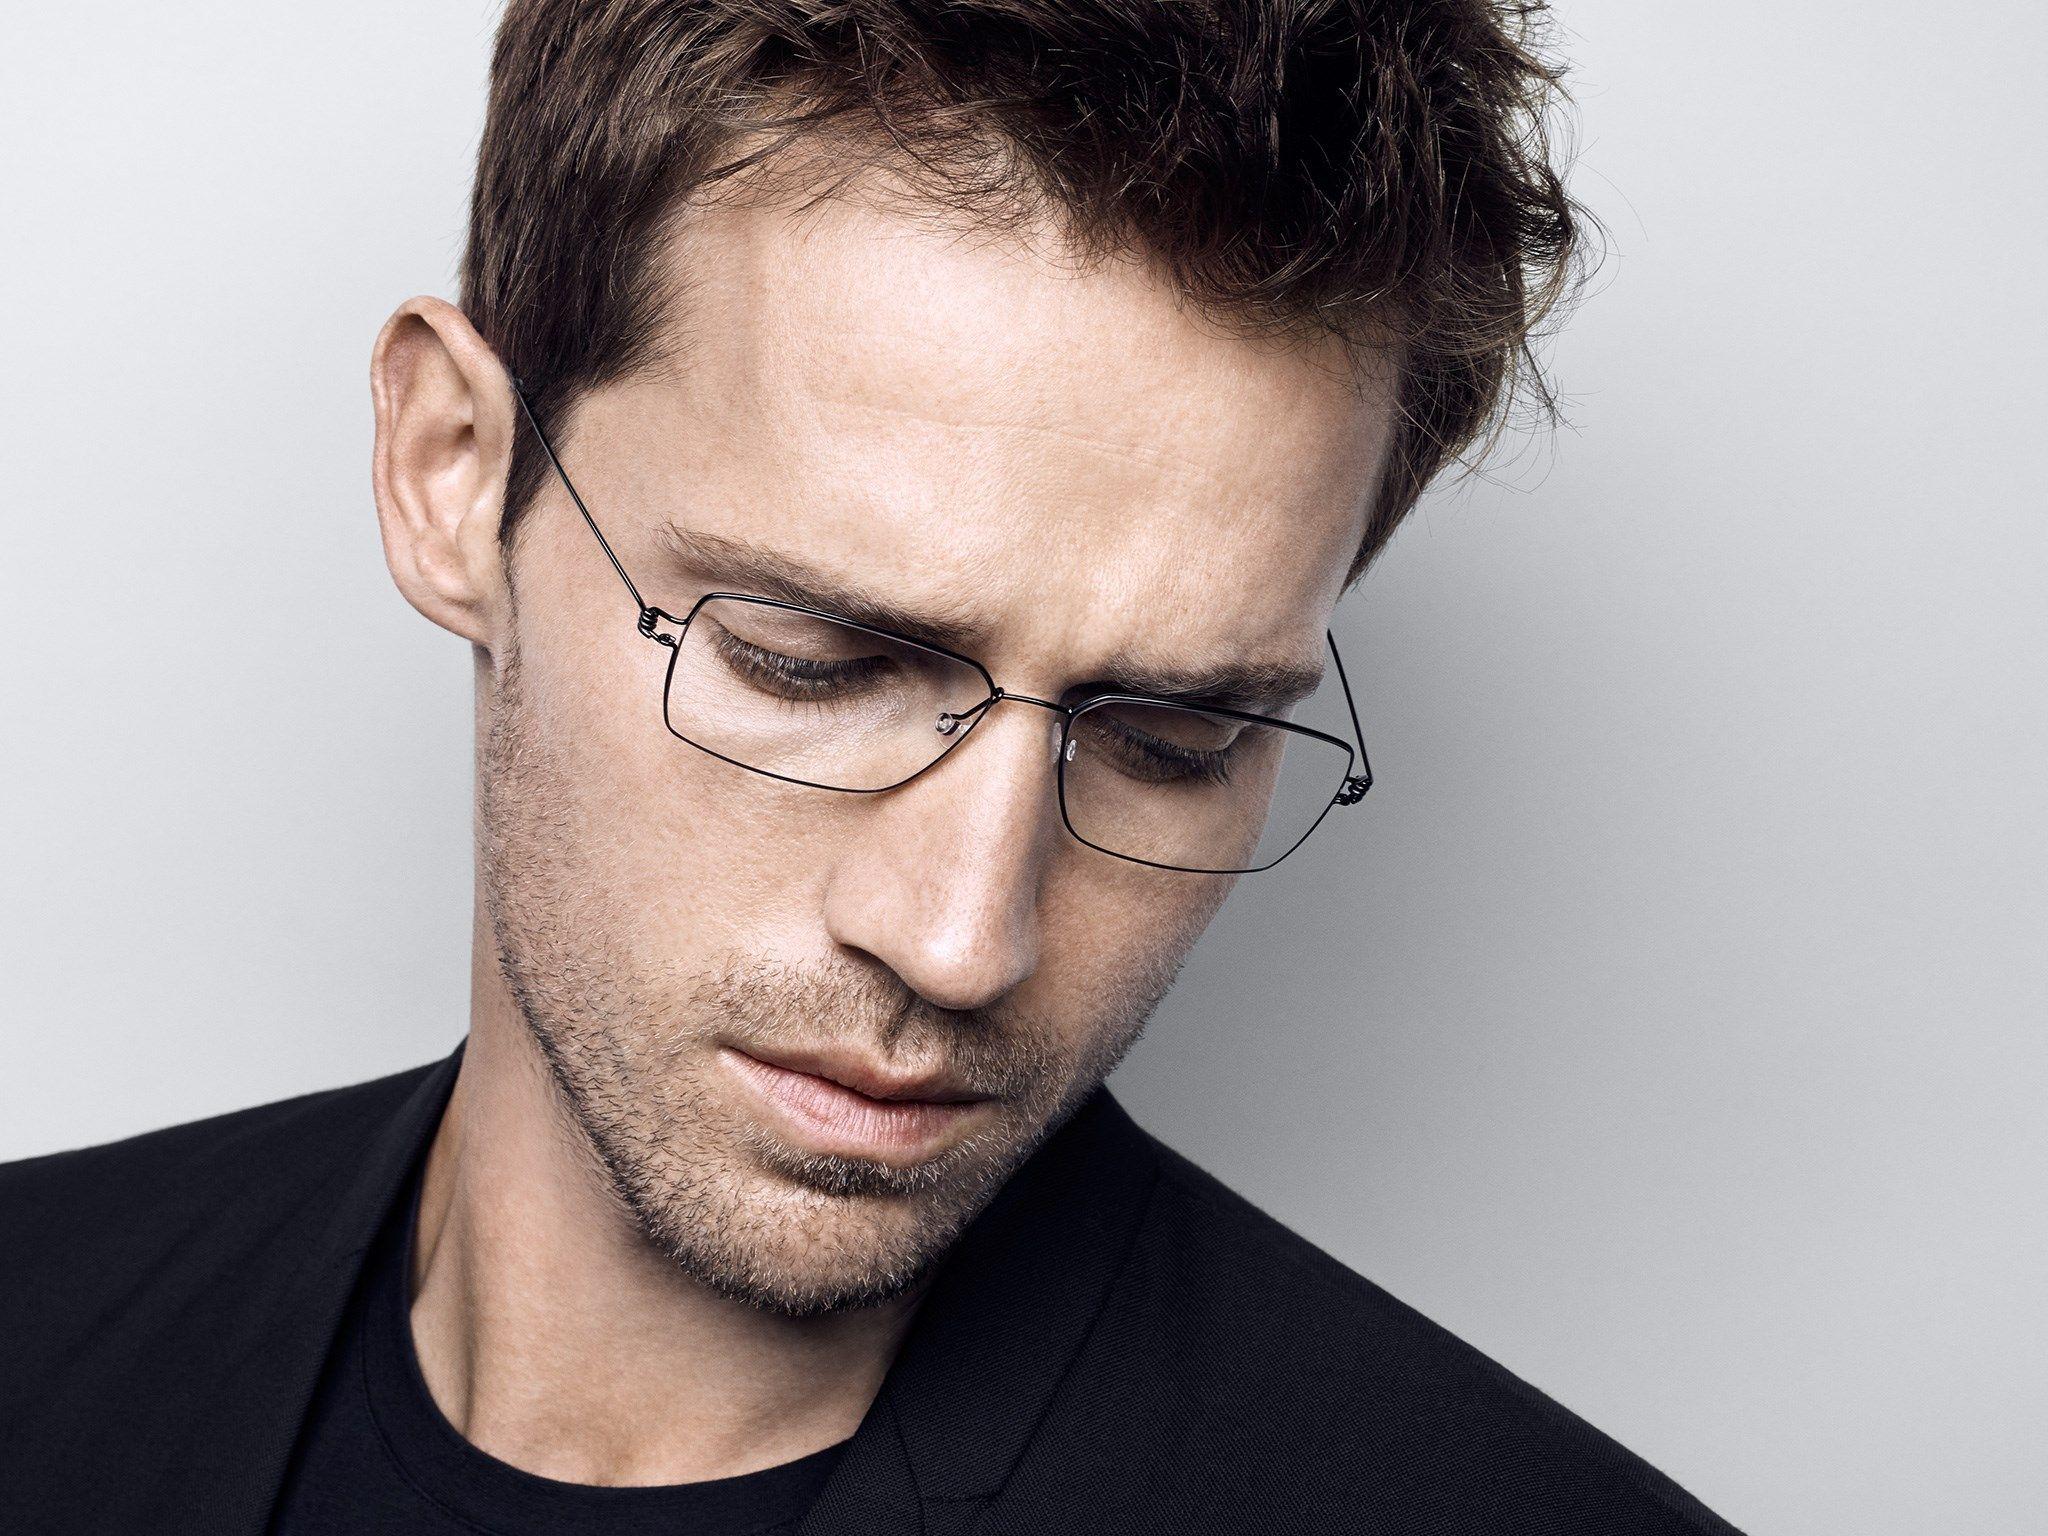 449a451d08 ... eyewear brand glasses frames male myopia ultralight personalized glasses  Business. LINDBERG air titanium rim – Men